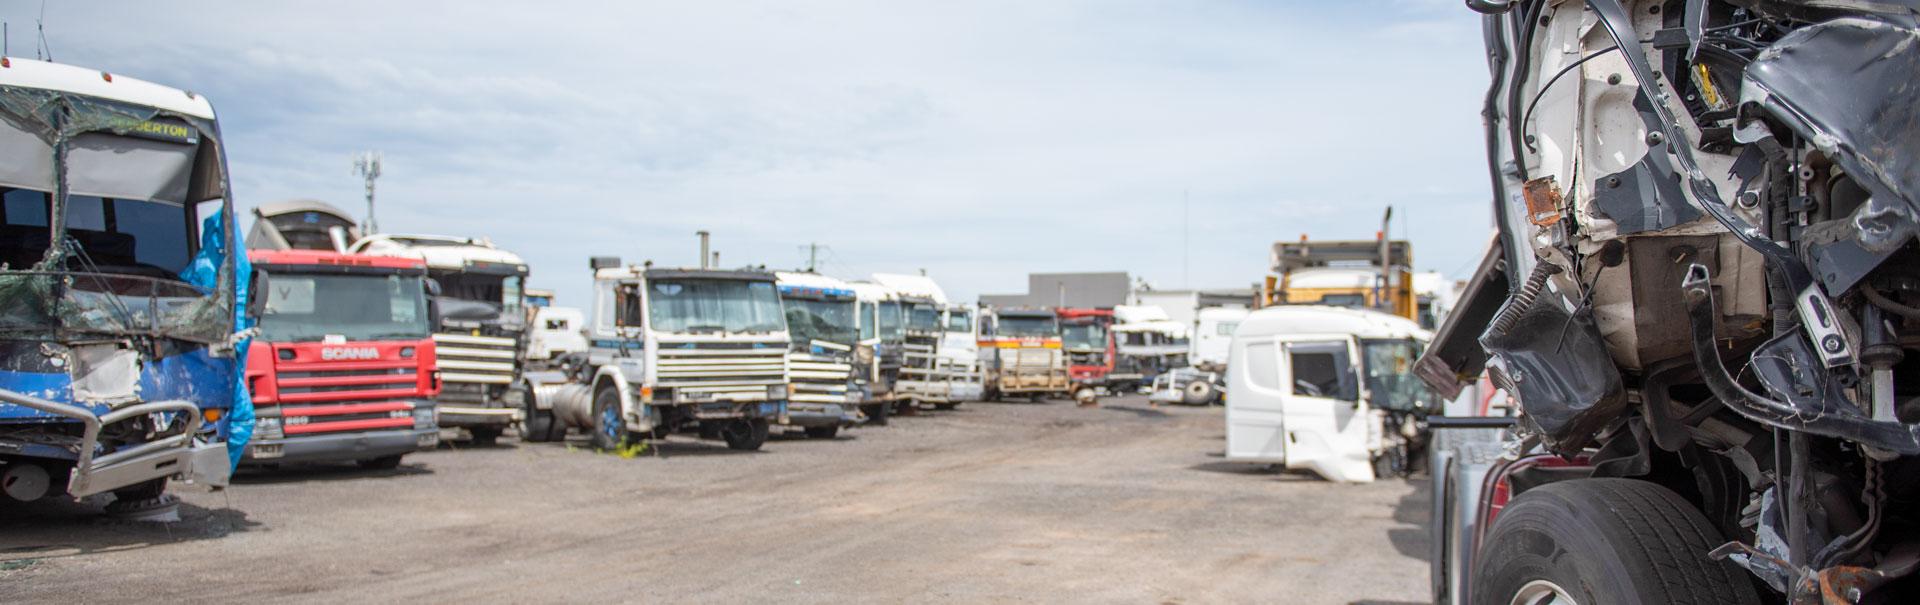 slider6 - euro trucks spares and repairs